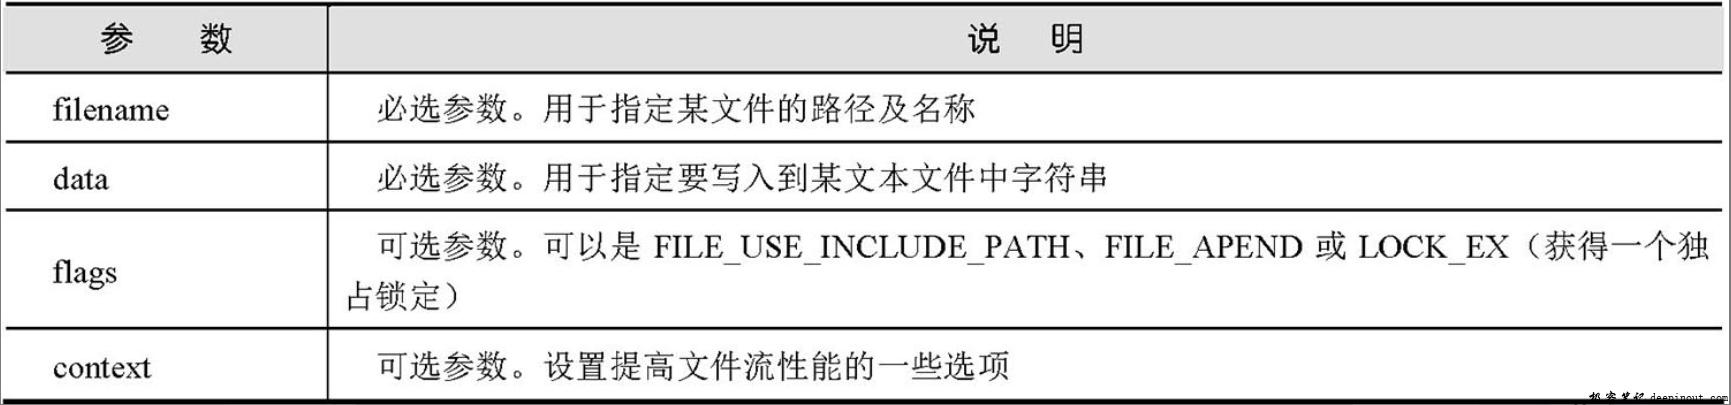 file_put_contents()函数参数说明